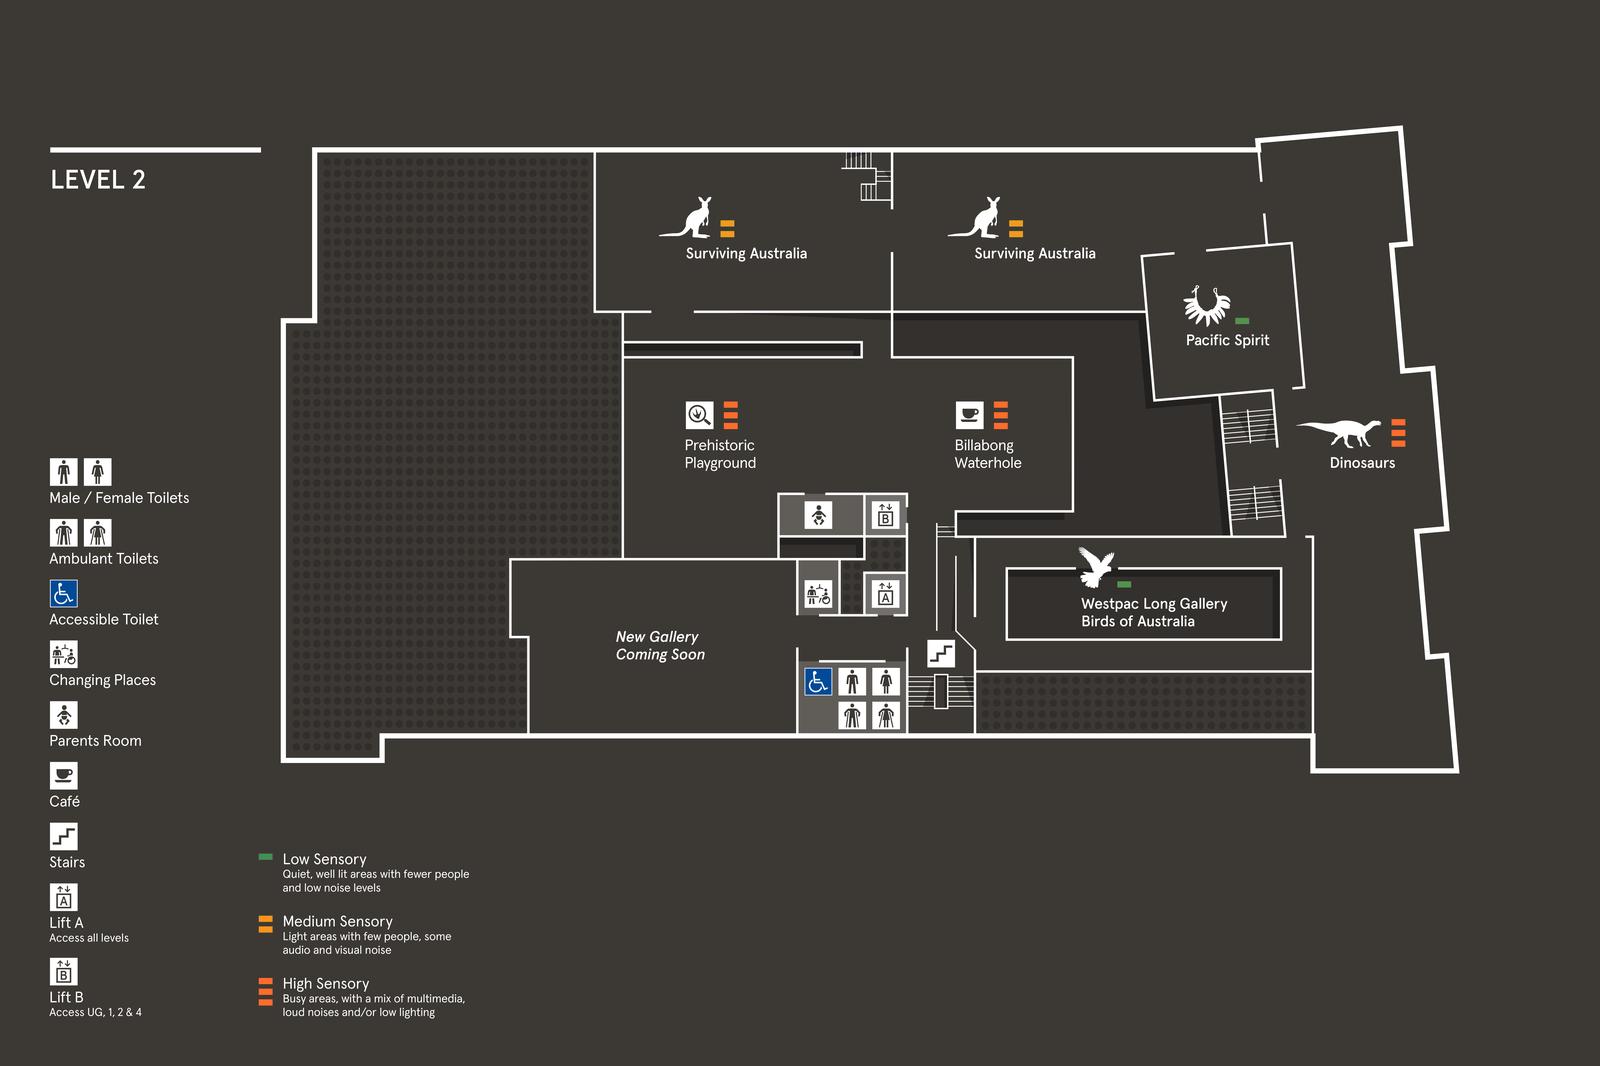 AM Map - Level 2